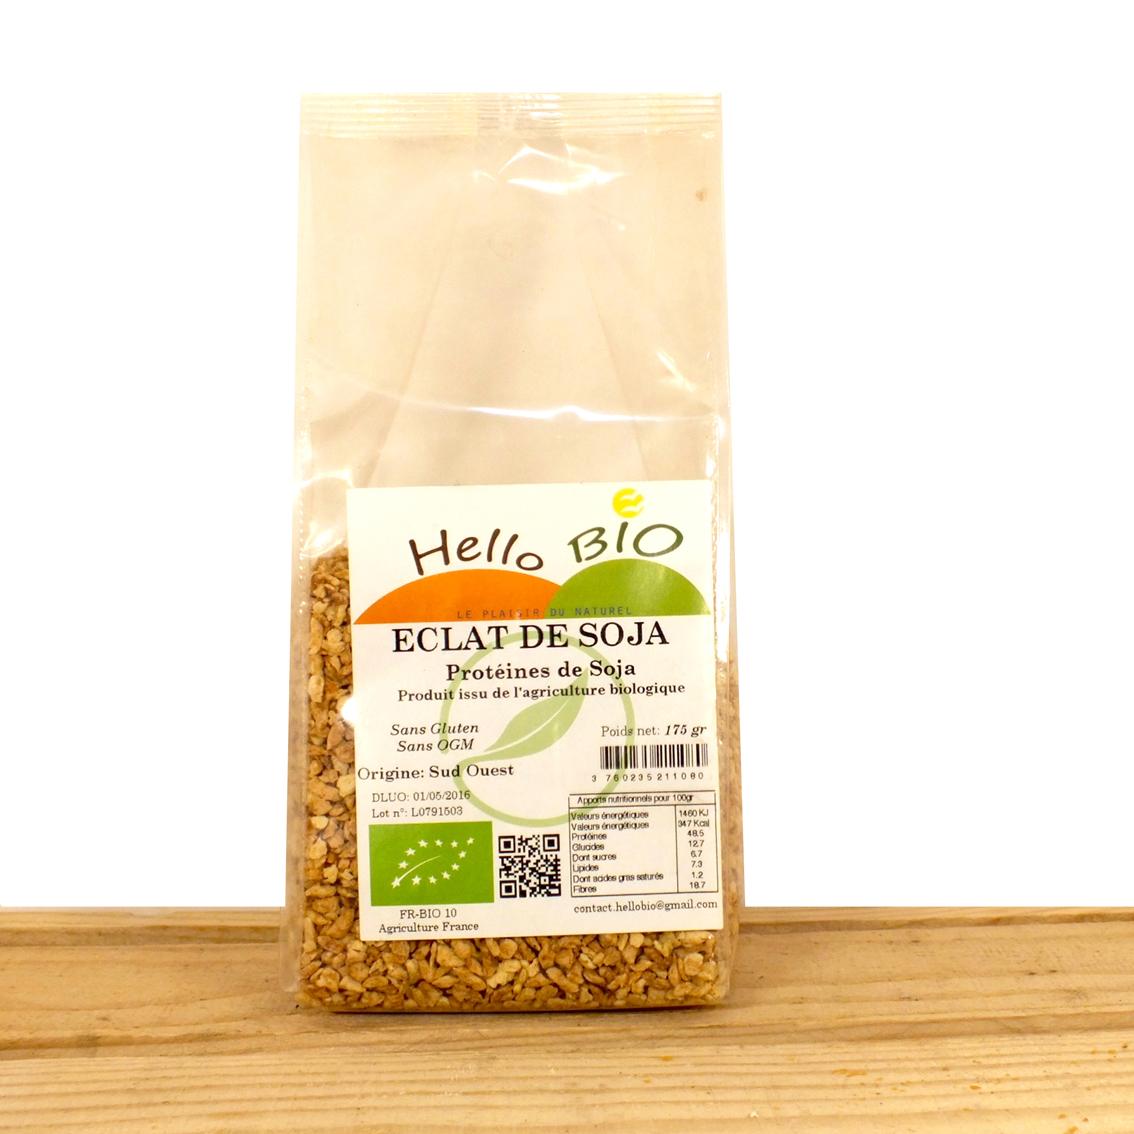 Eclat ou Farine de Soja Hellobio Bioagricola